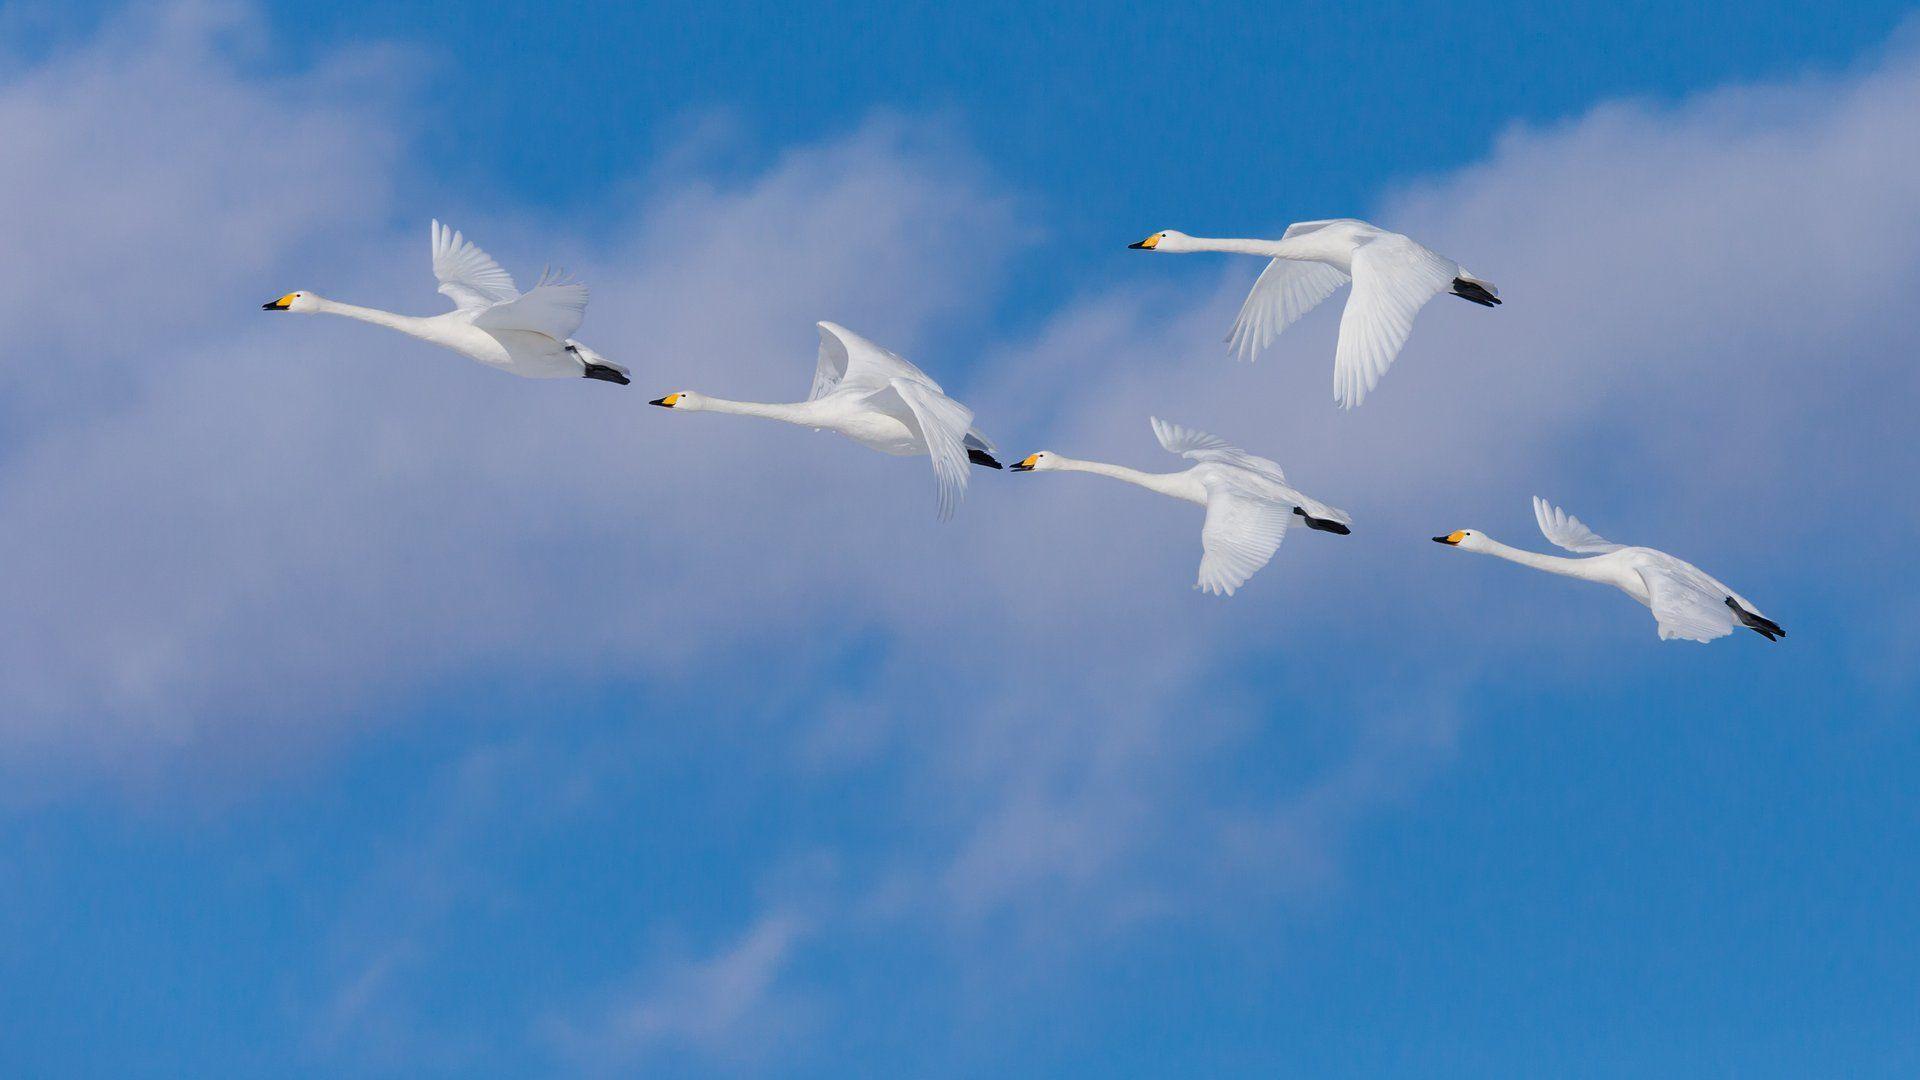 лебедь, небо, облака, полет, хоккайдо, cиретоко, япония, Роман Мурушкин